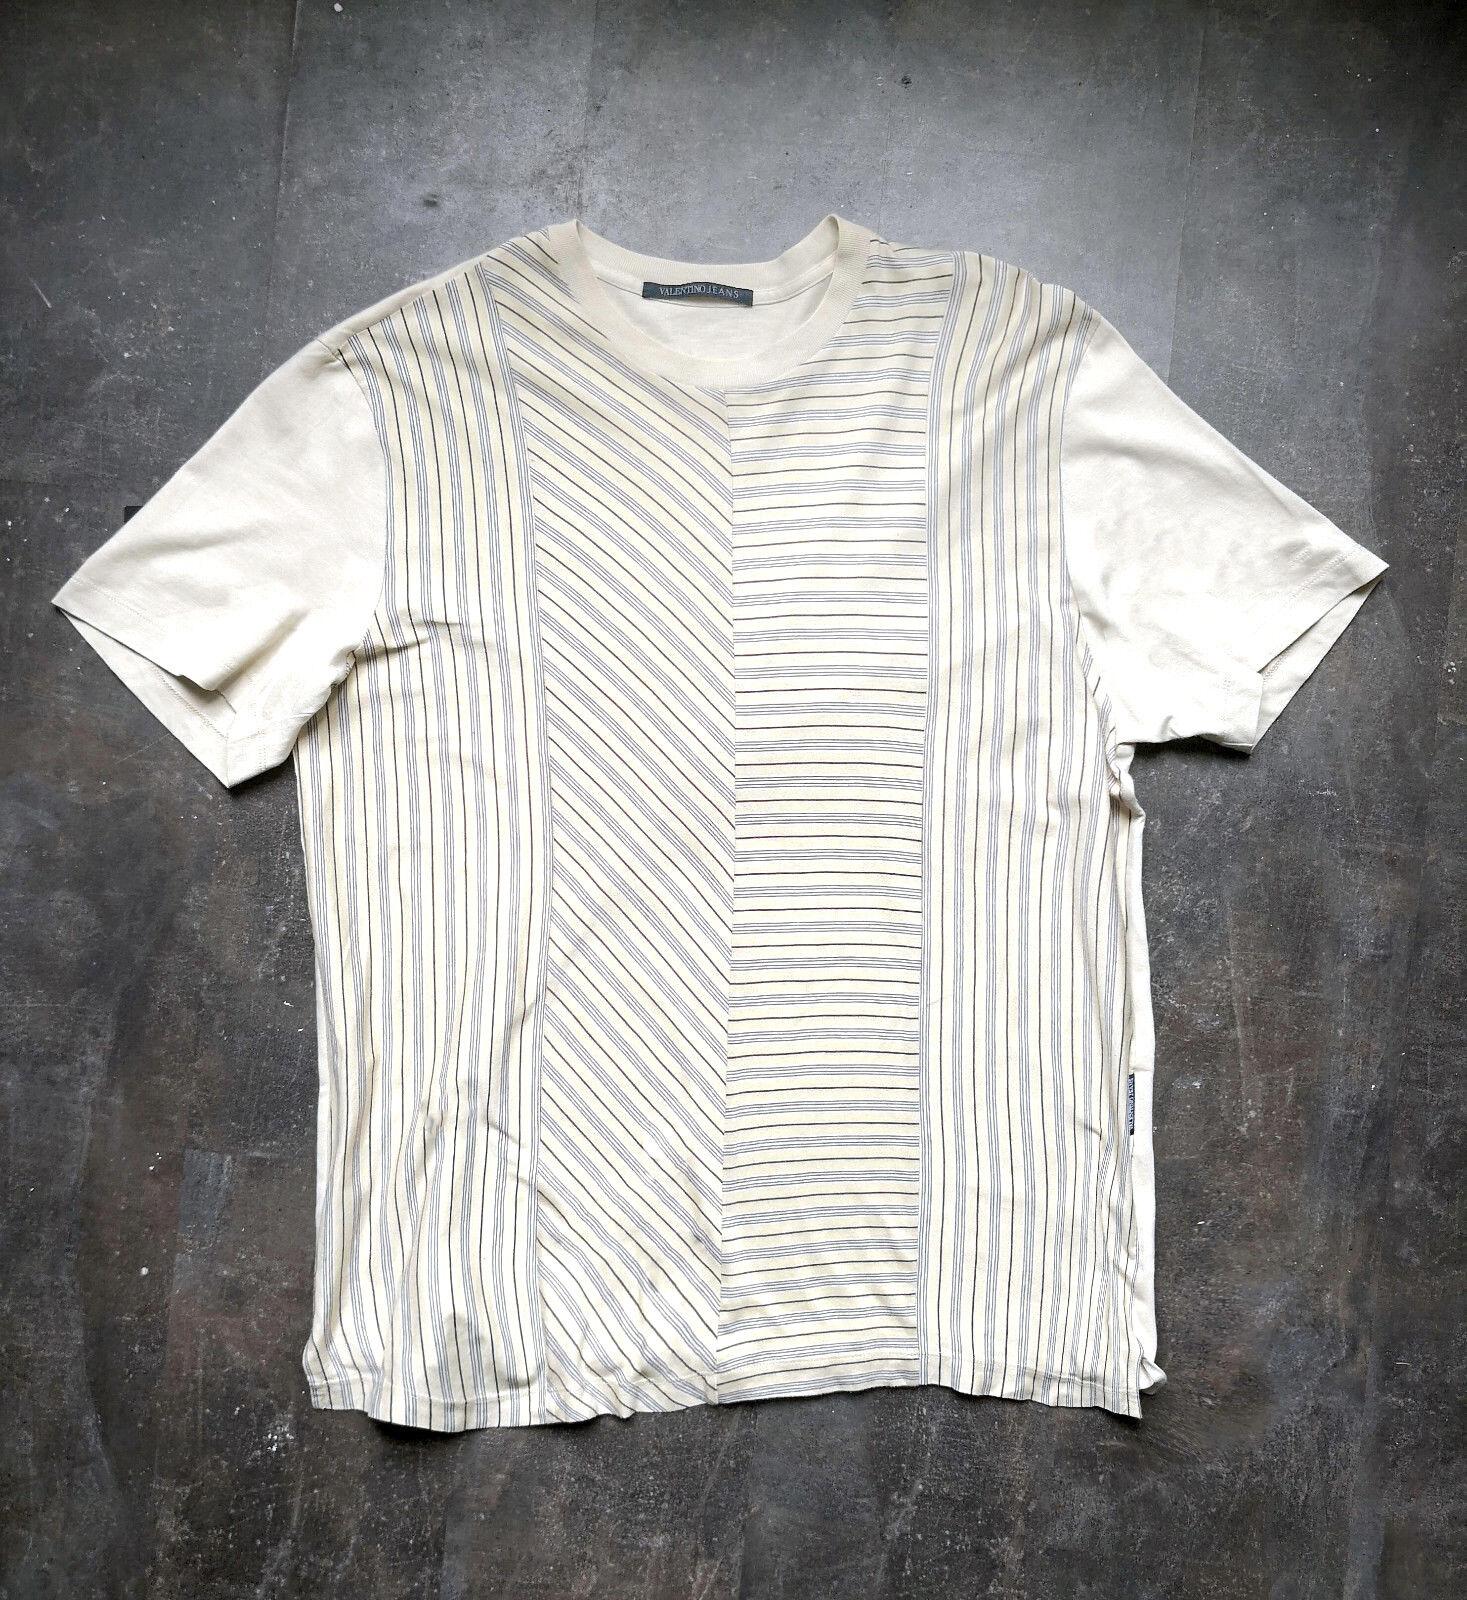 VALENTINO T-shirt coton 100 % Größe L